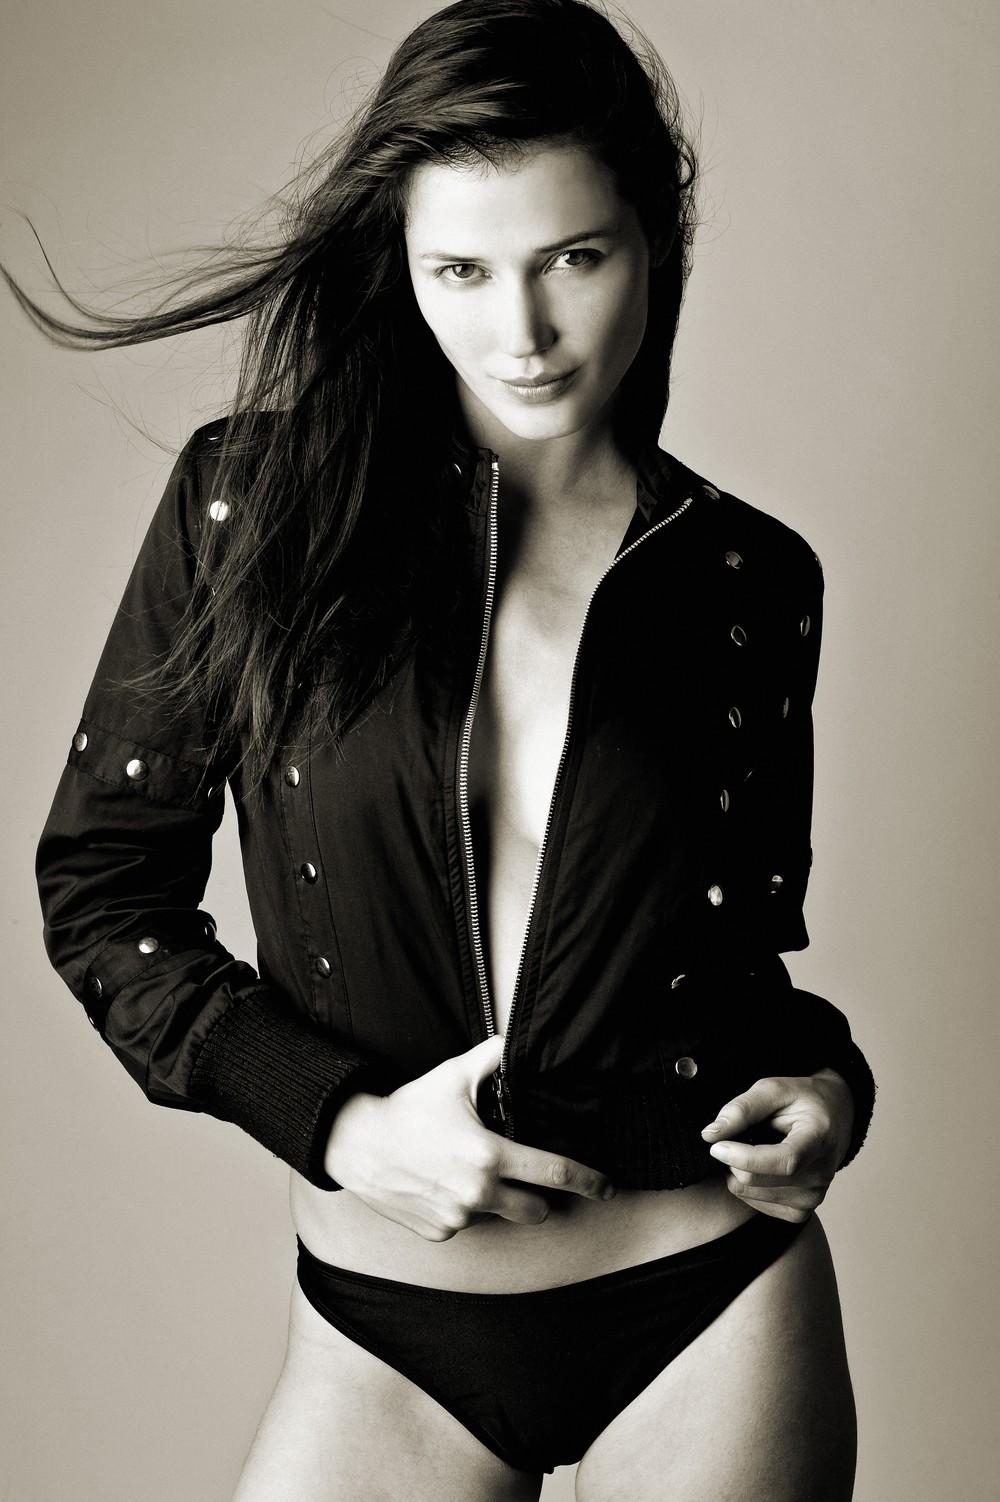 Zara Holland nudes (52 photos), Topless, Fappening, Instagram, legs 2020